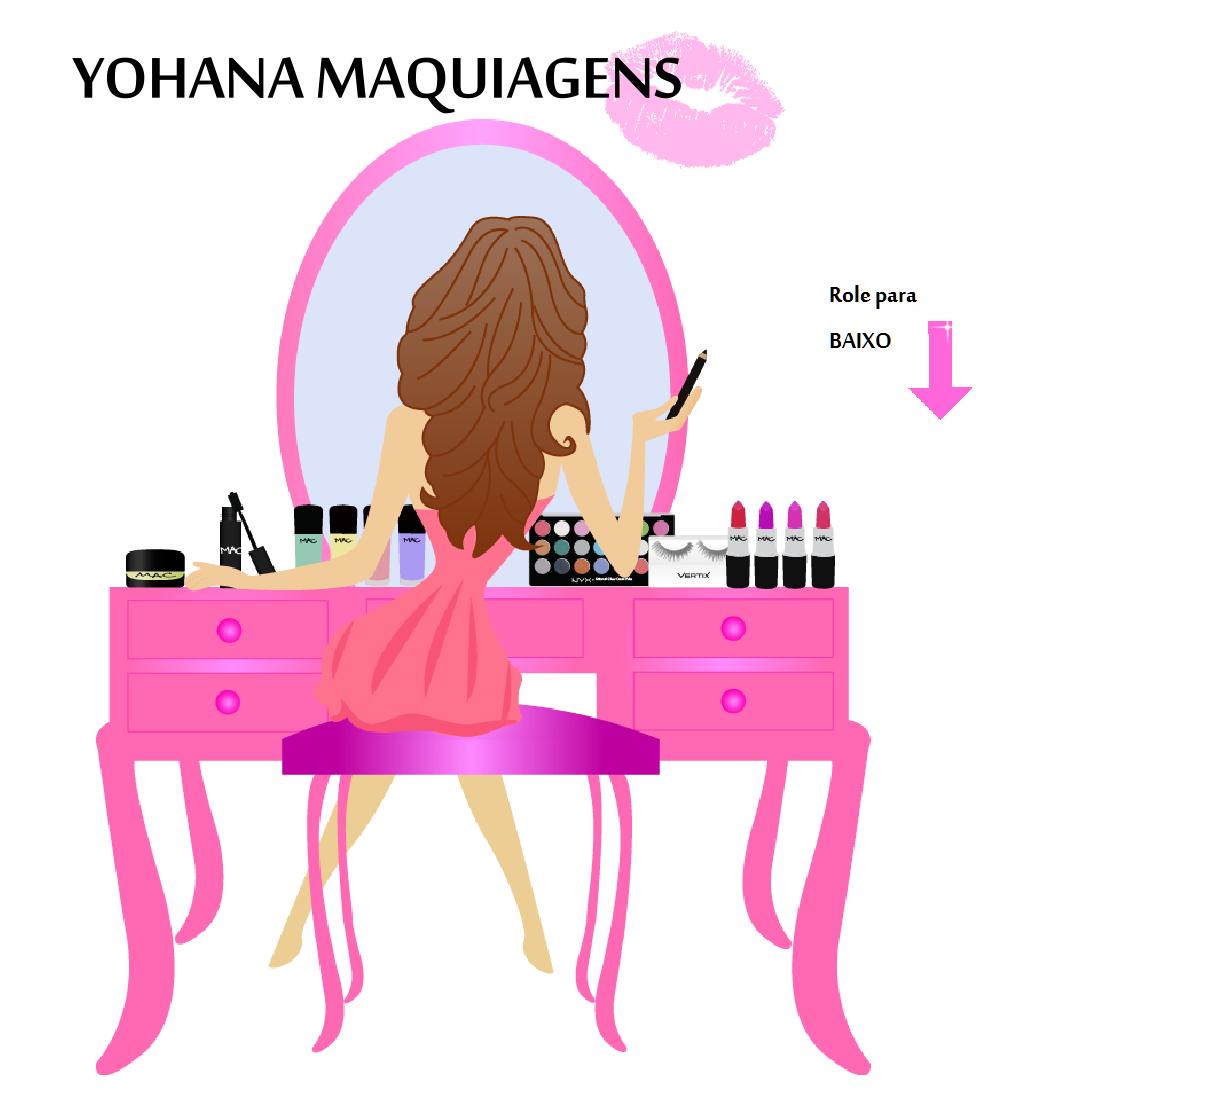 Yohana maquiagens